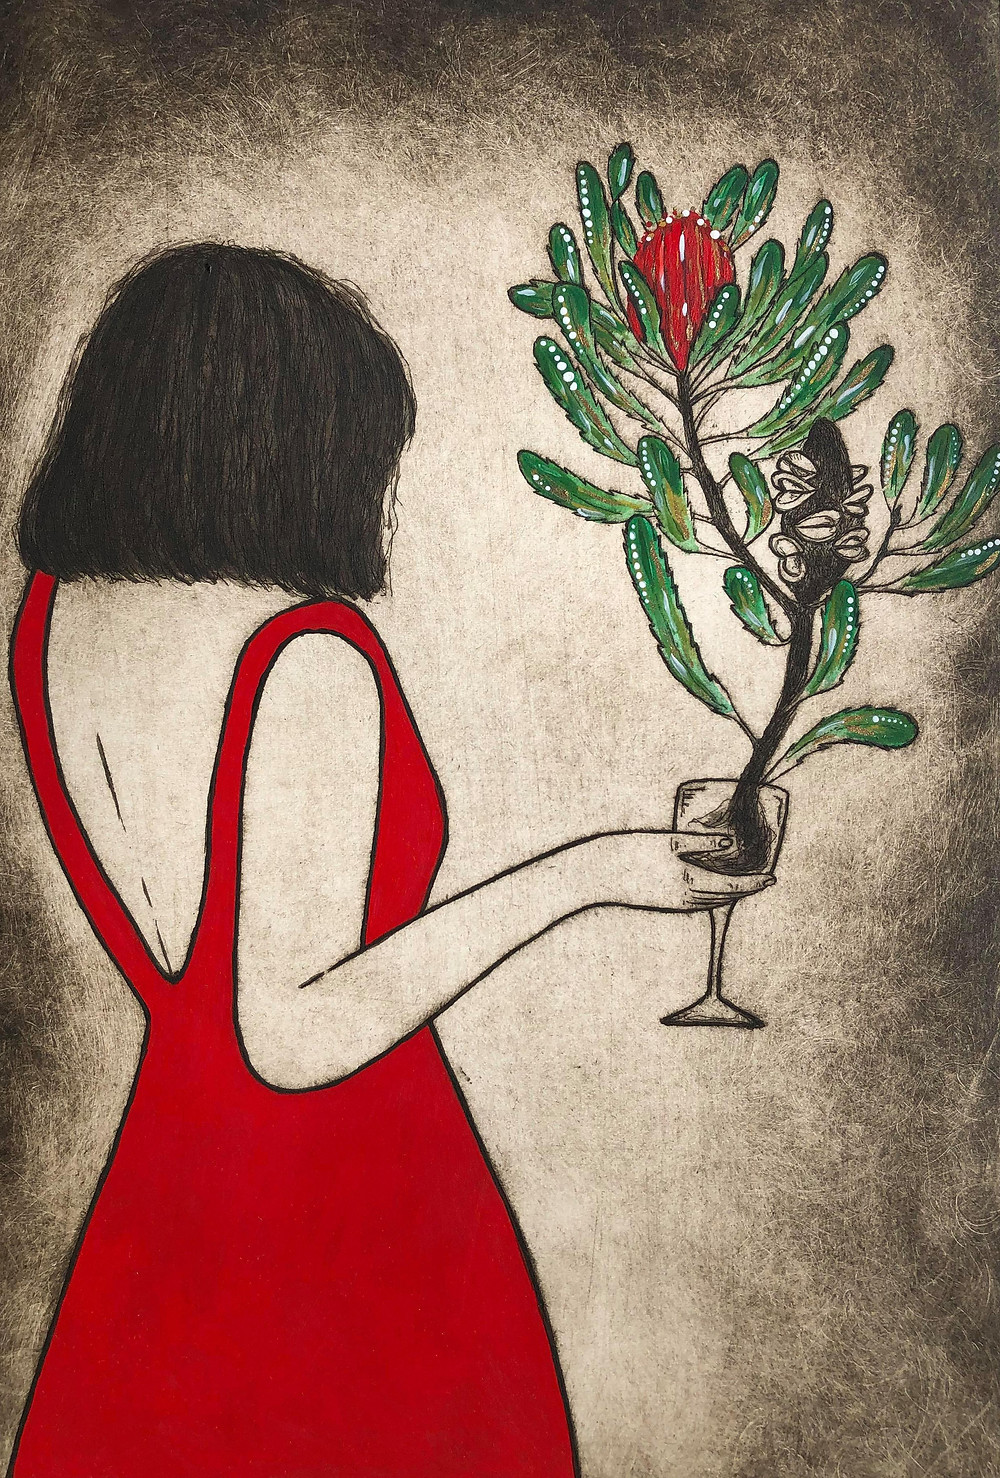 wine glass, wine art, red dress, red art, banksia art, Australian flower art, bob cut lady, lady with wineglass, Australian native plants, Australian botanical art, etching, printmaking art, Kate Piekutowski printmaker